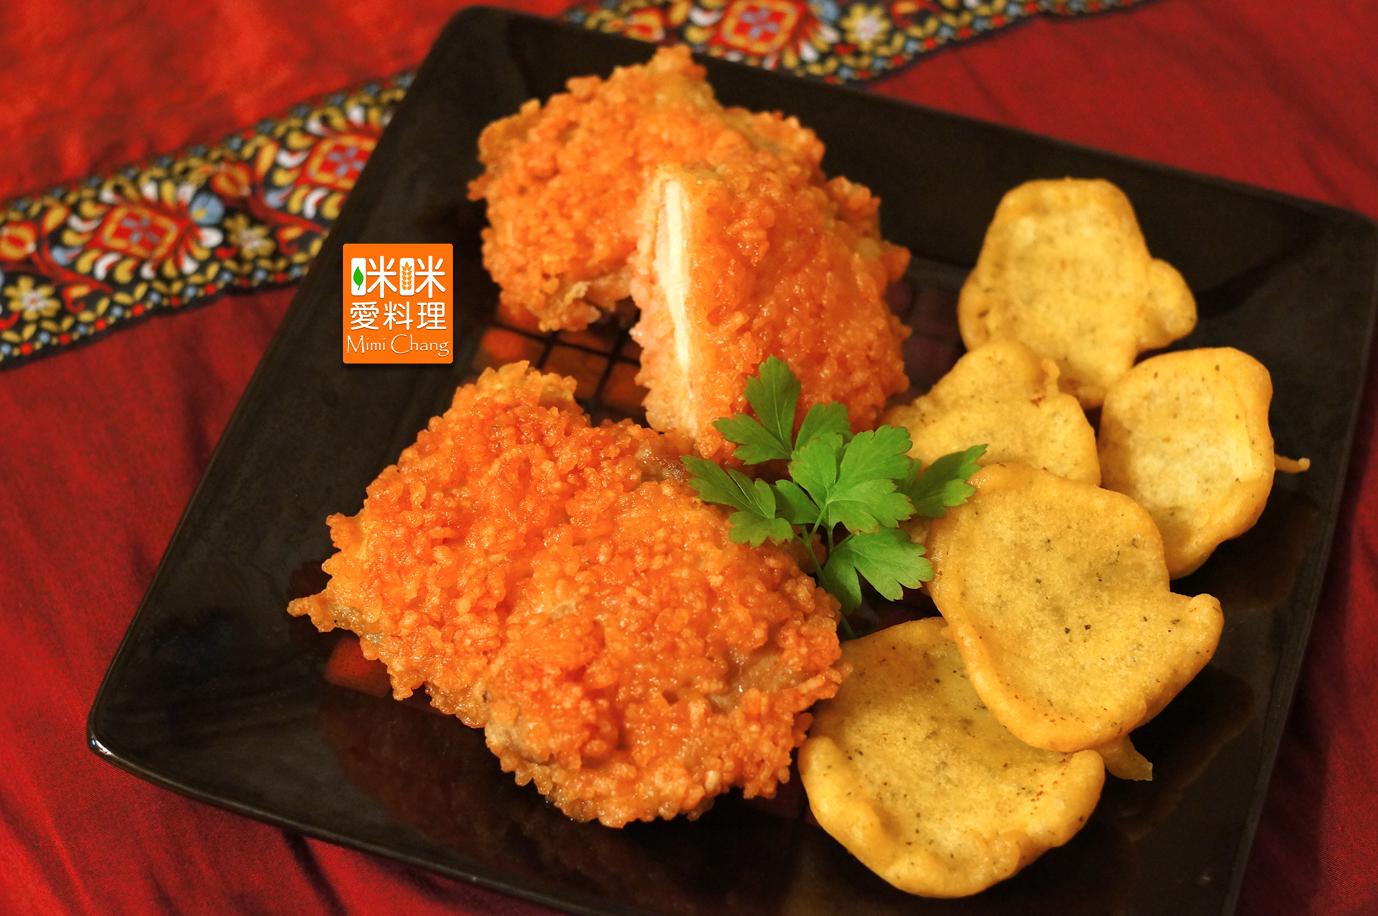 Mimi♥紅麴米香雞排【彩色營養米】